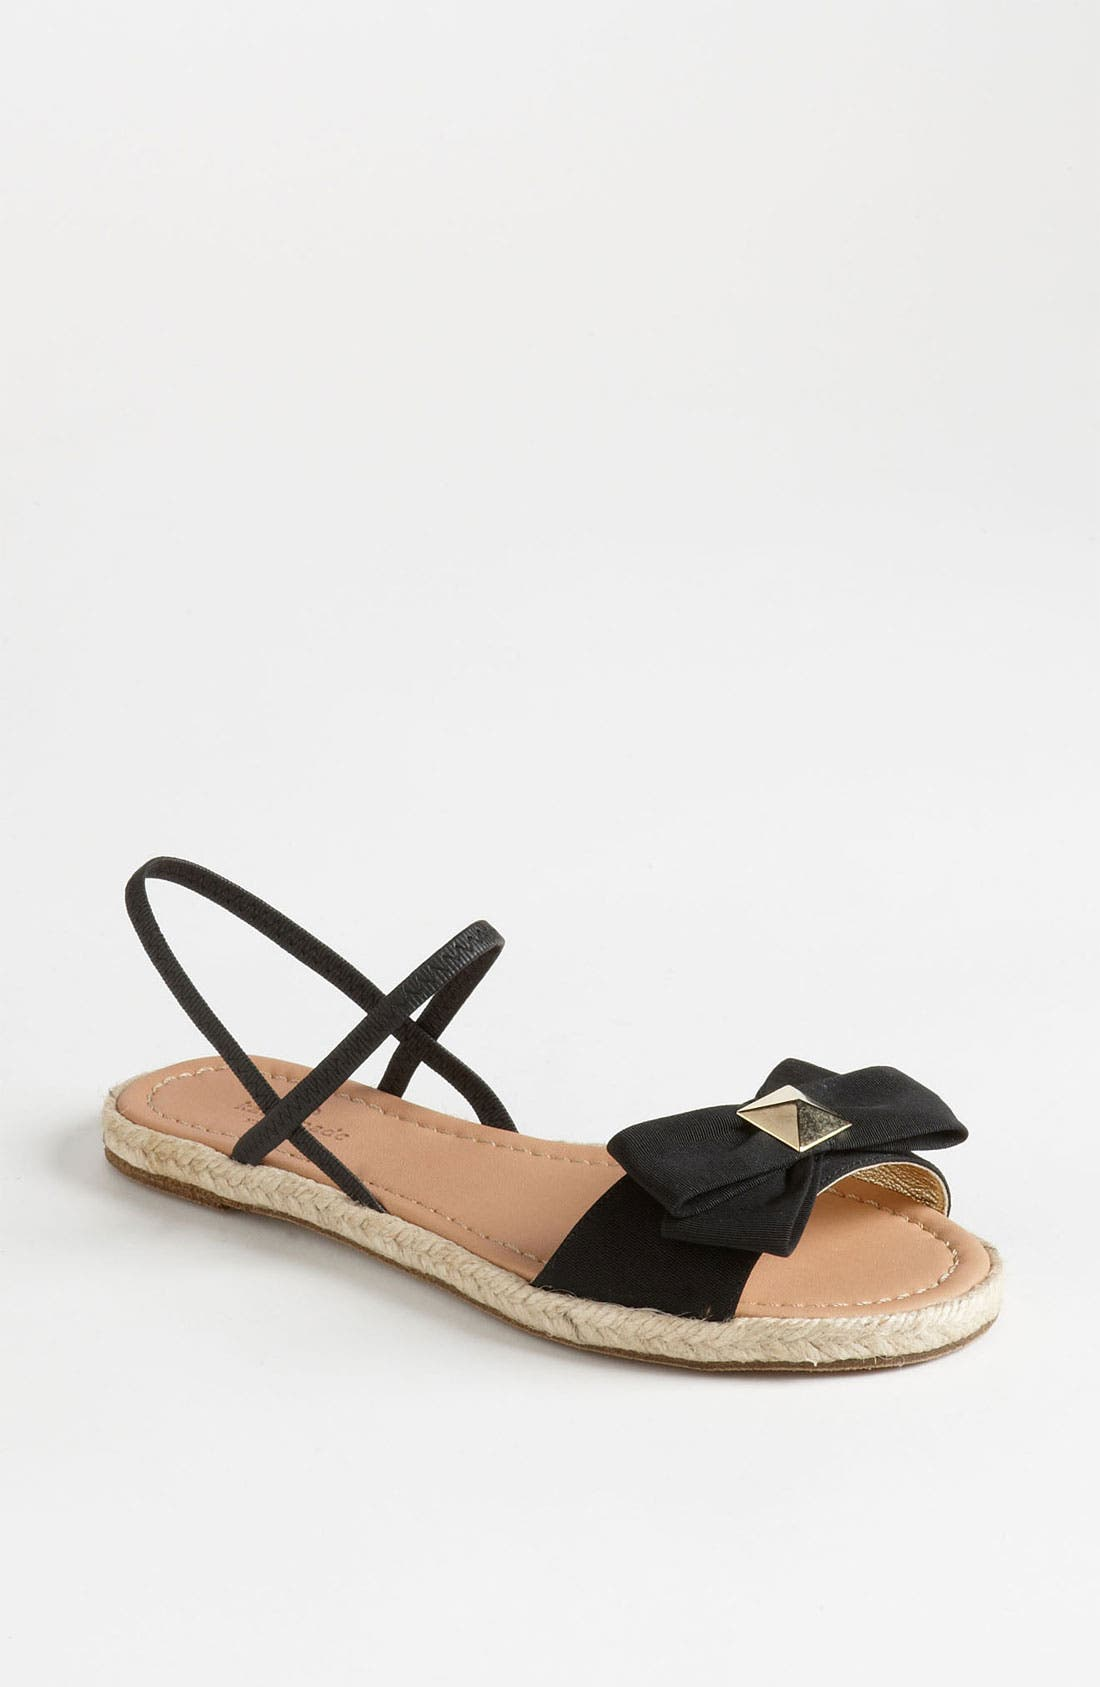 Alternate Image 1 Selected - kate spade new york 'cece' sandal